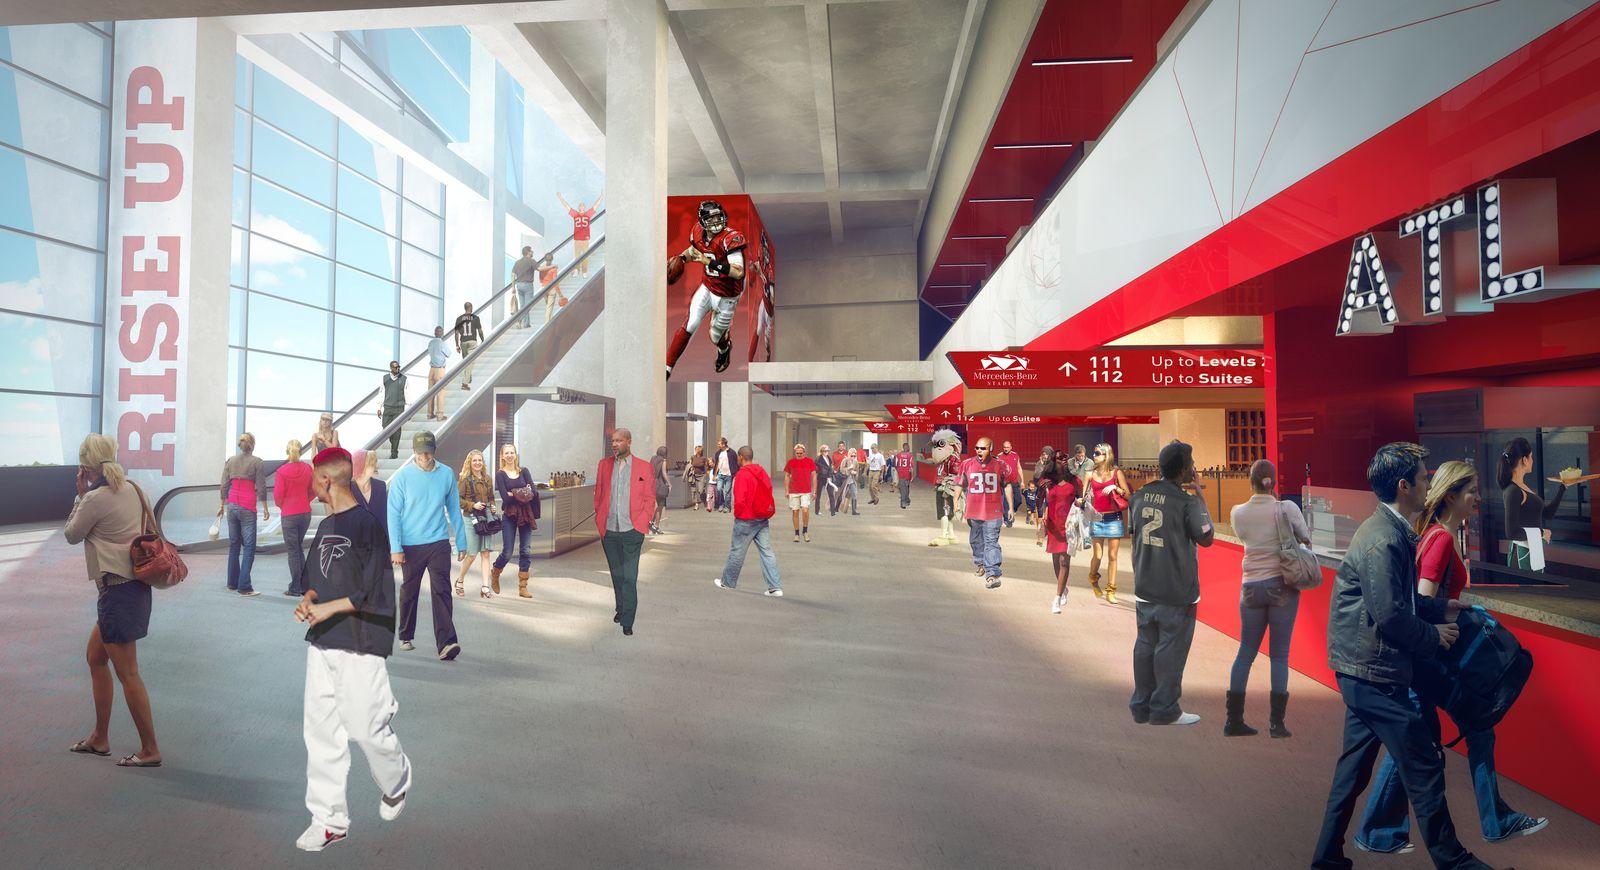 Design mercedes benz stadium for Mercedes benz stadium events